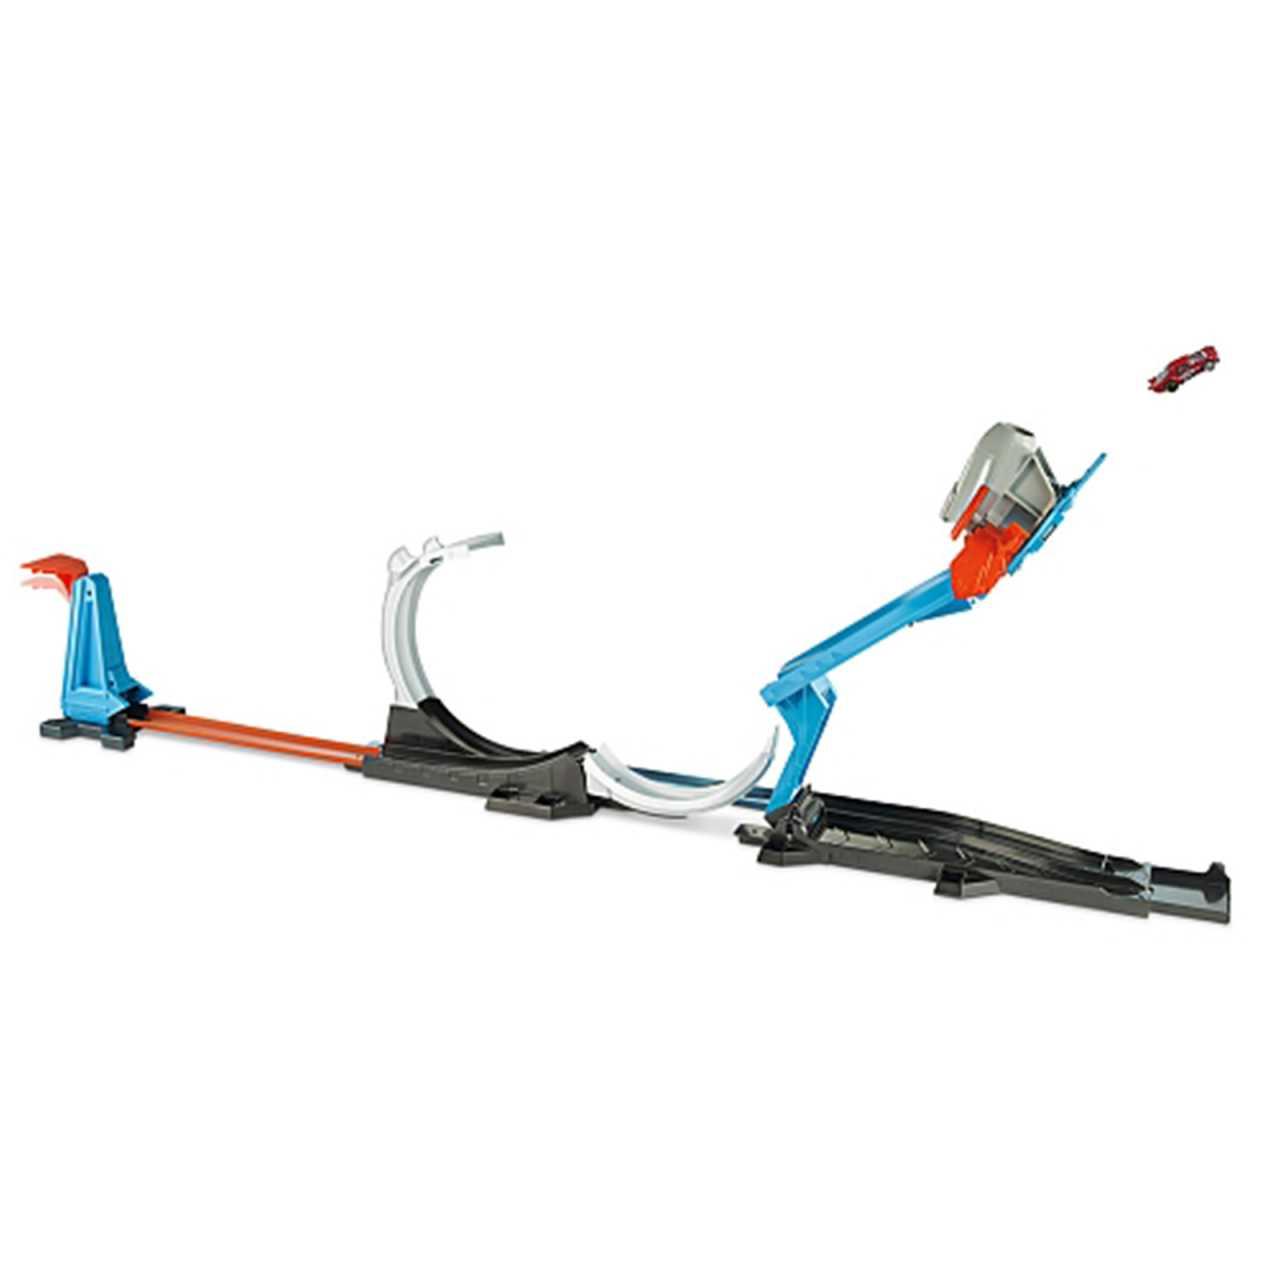 Mattel Hot Wheels Track Builder Raktenstart Herausforderung FLK60